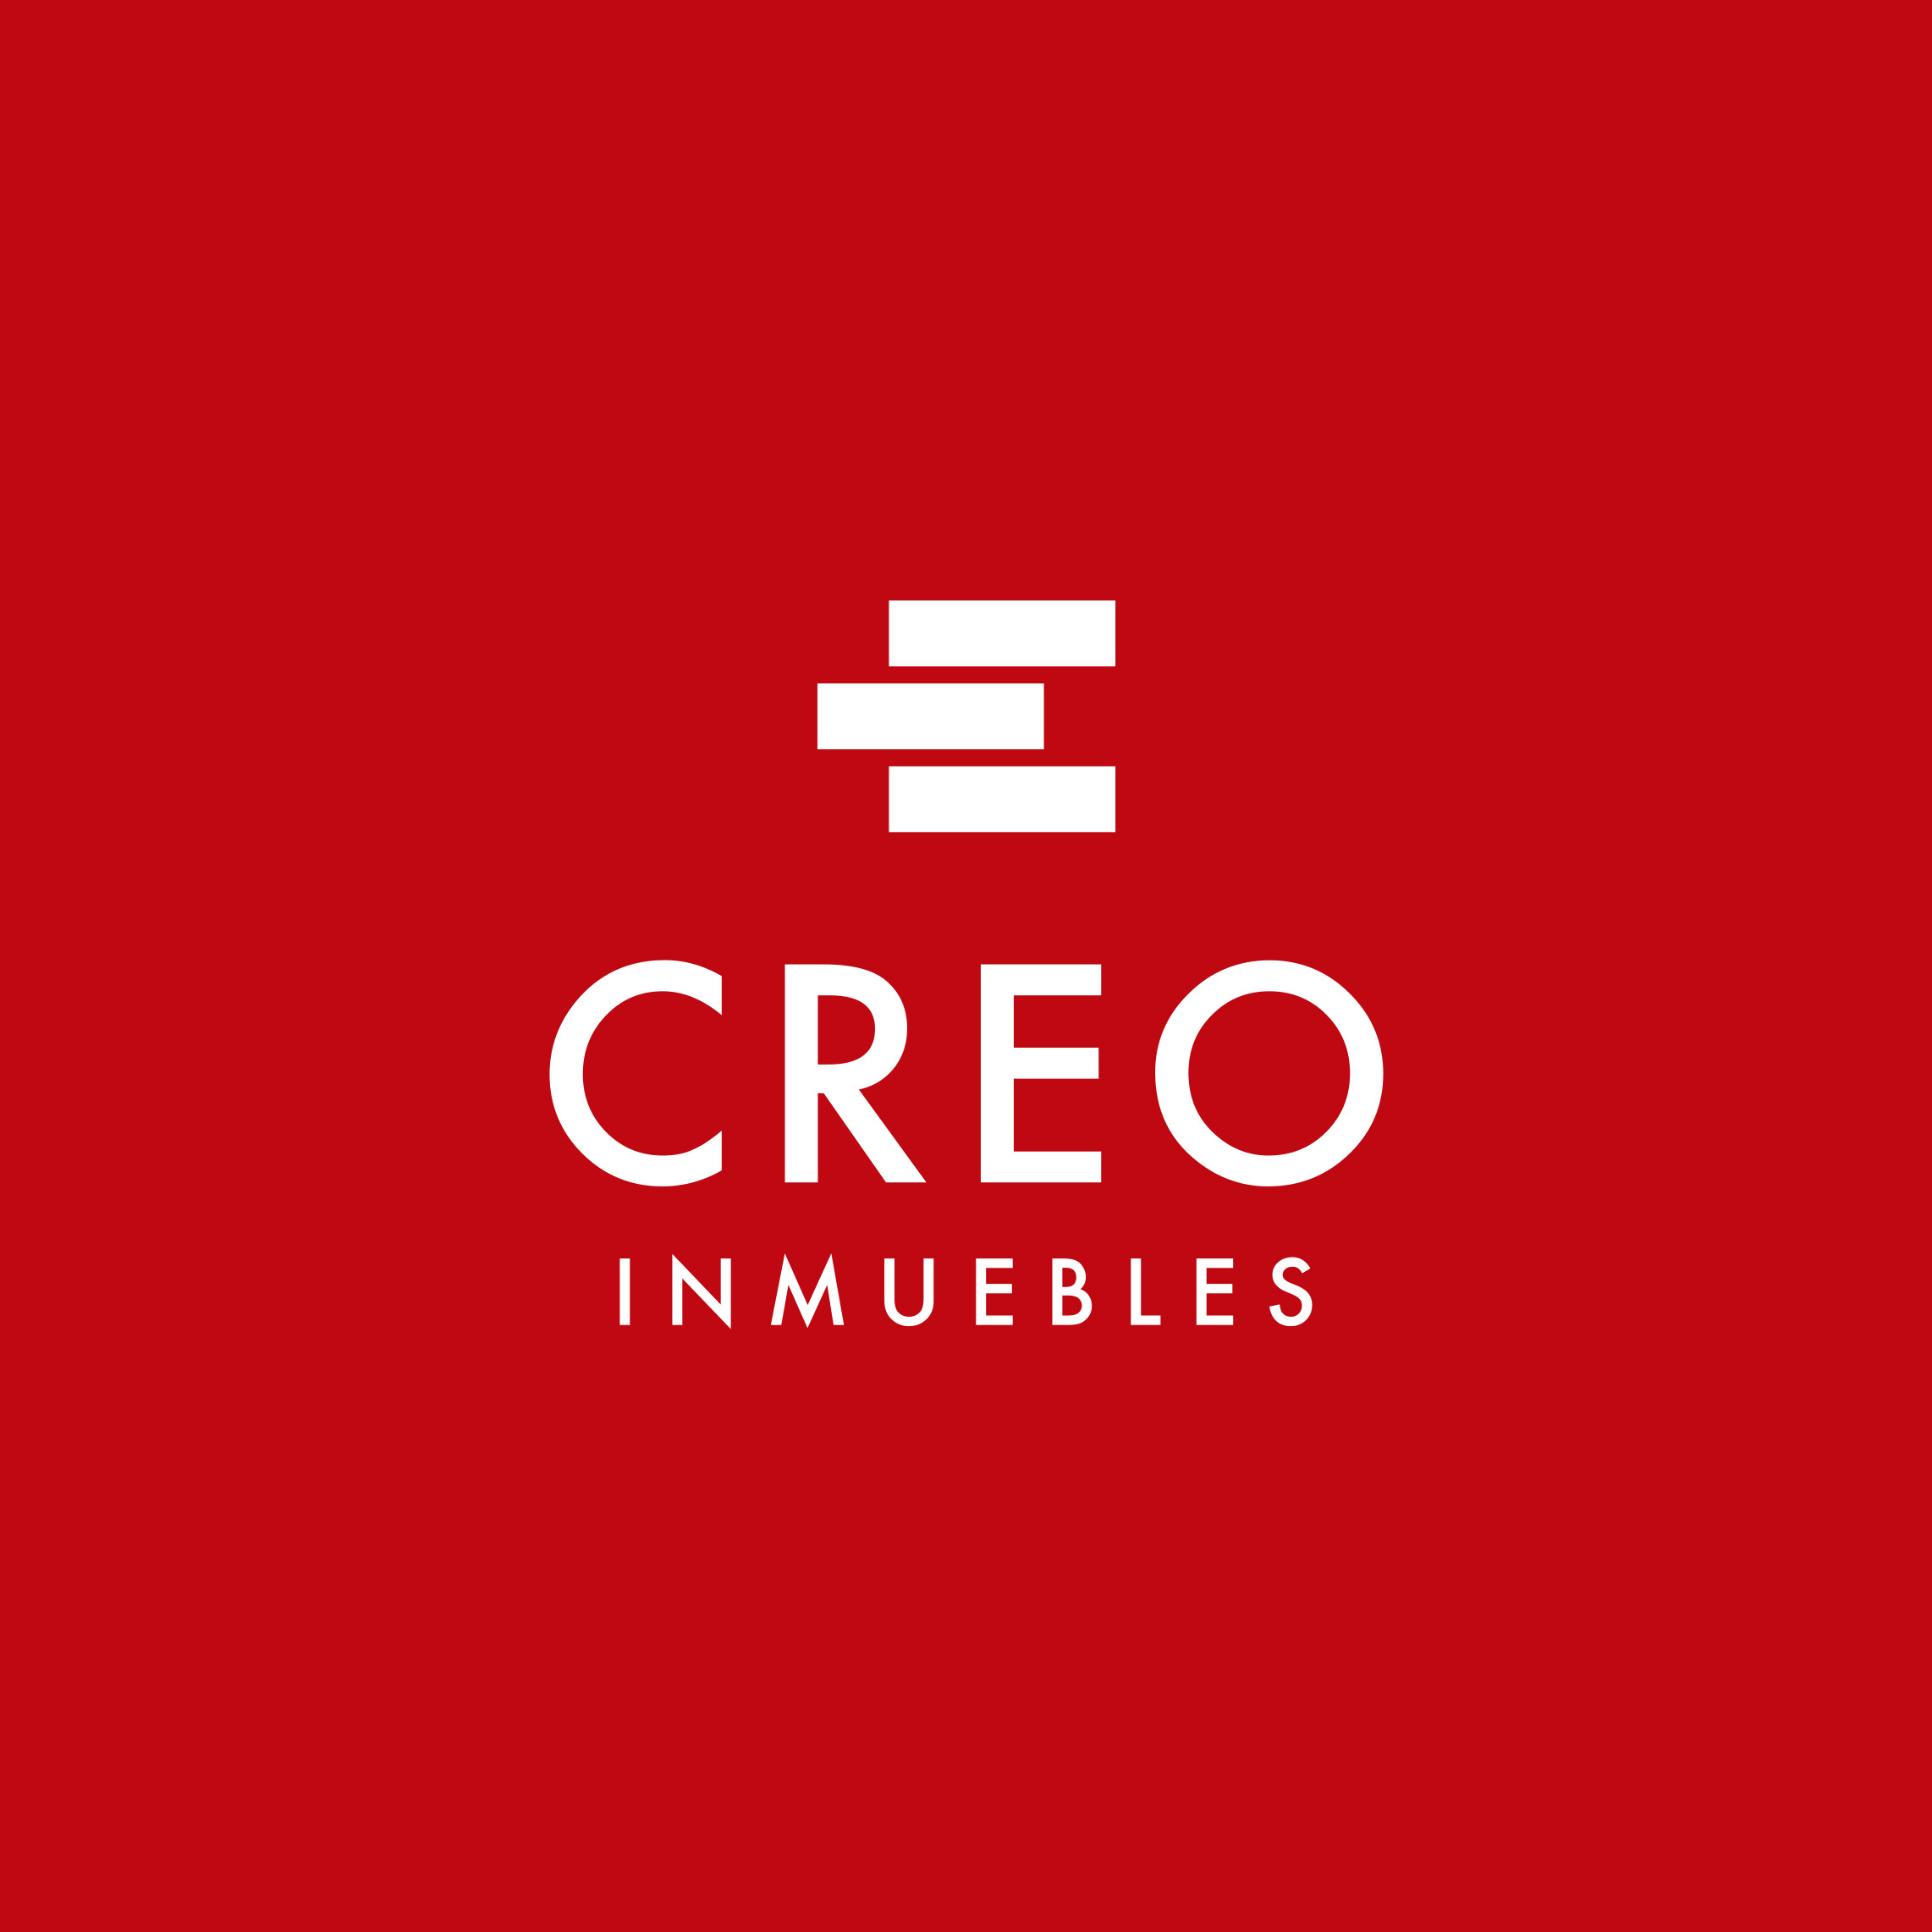 CREO INMUEBLES